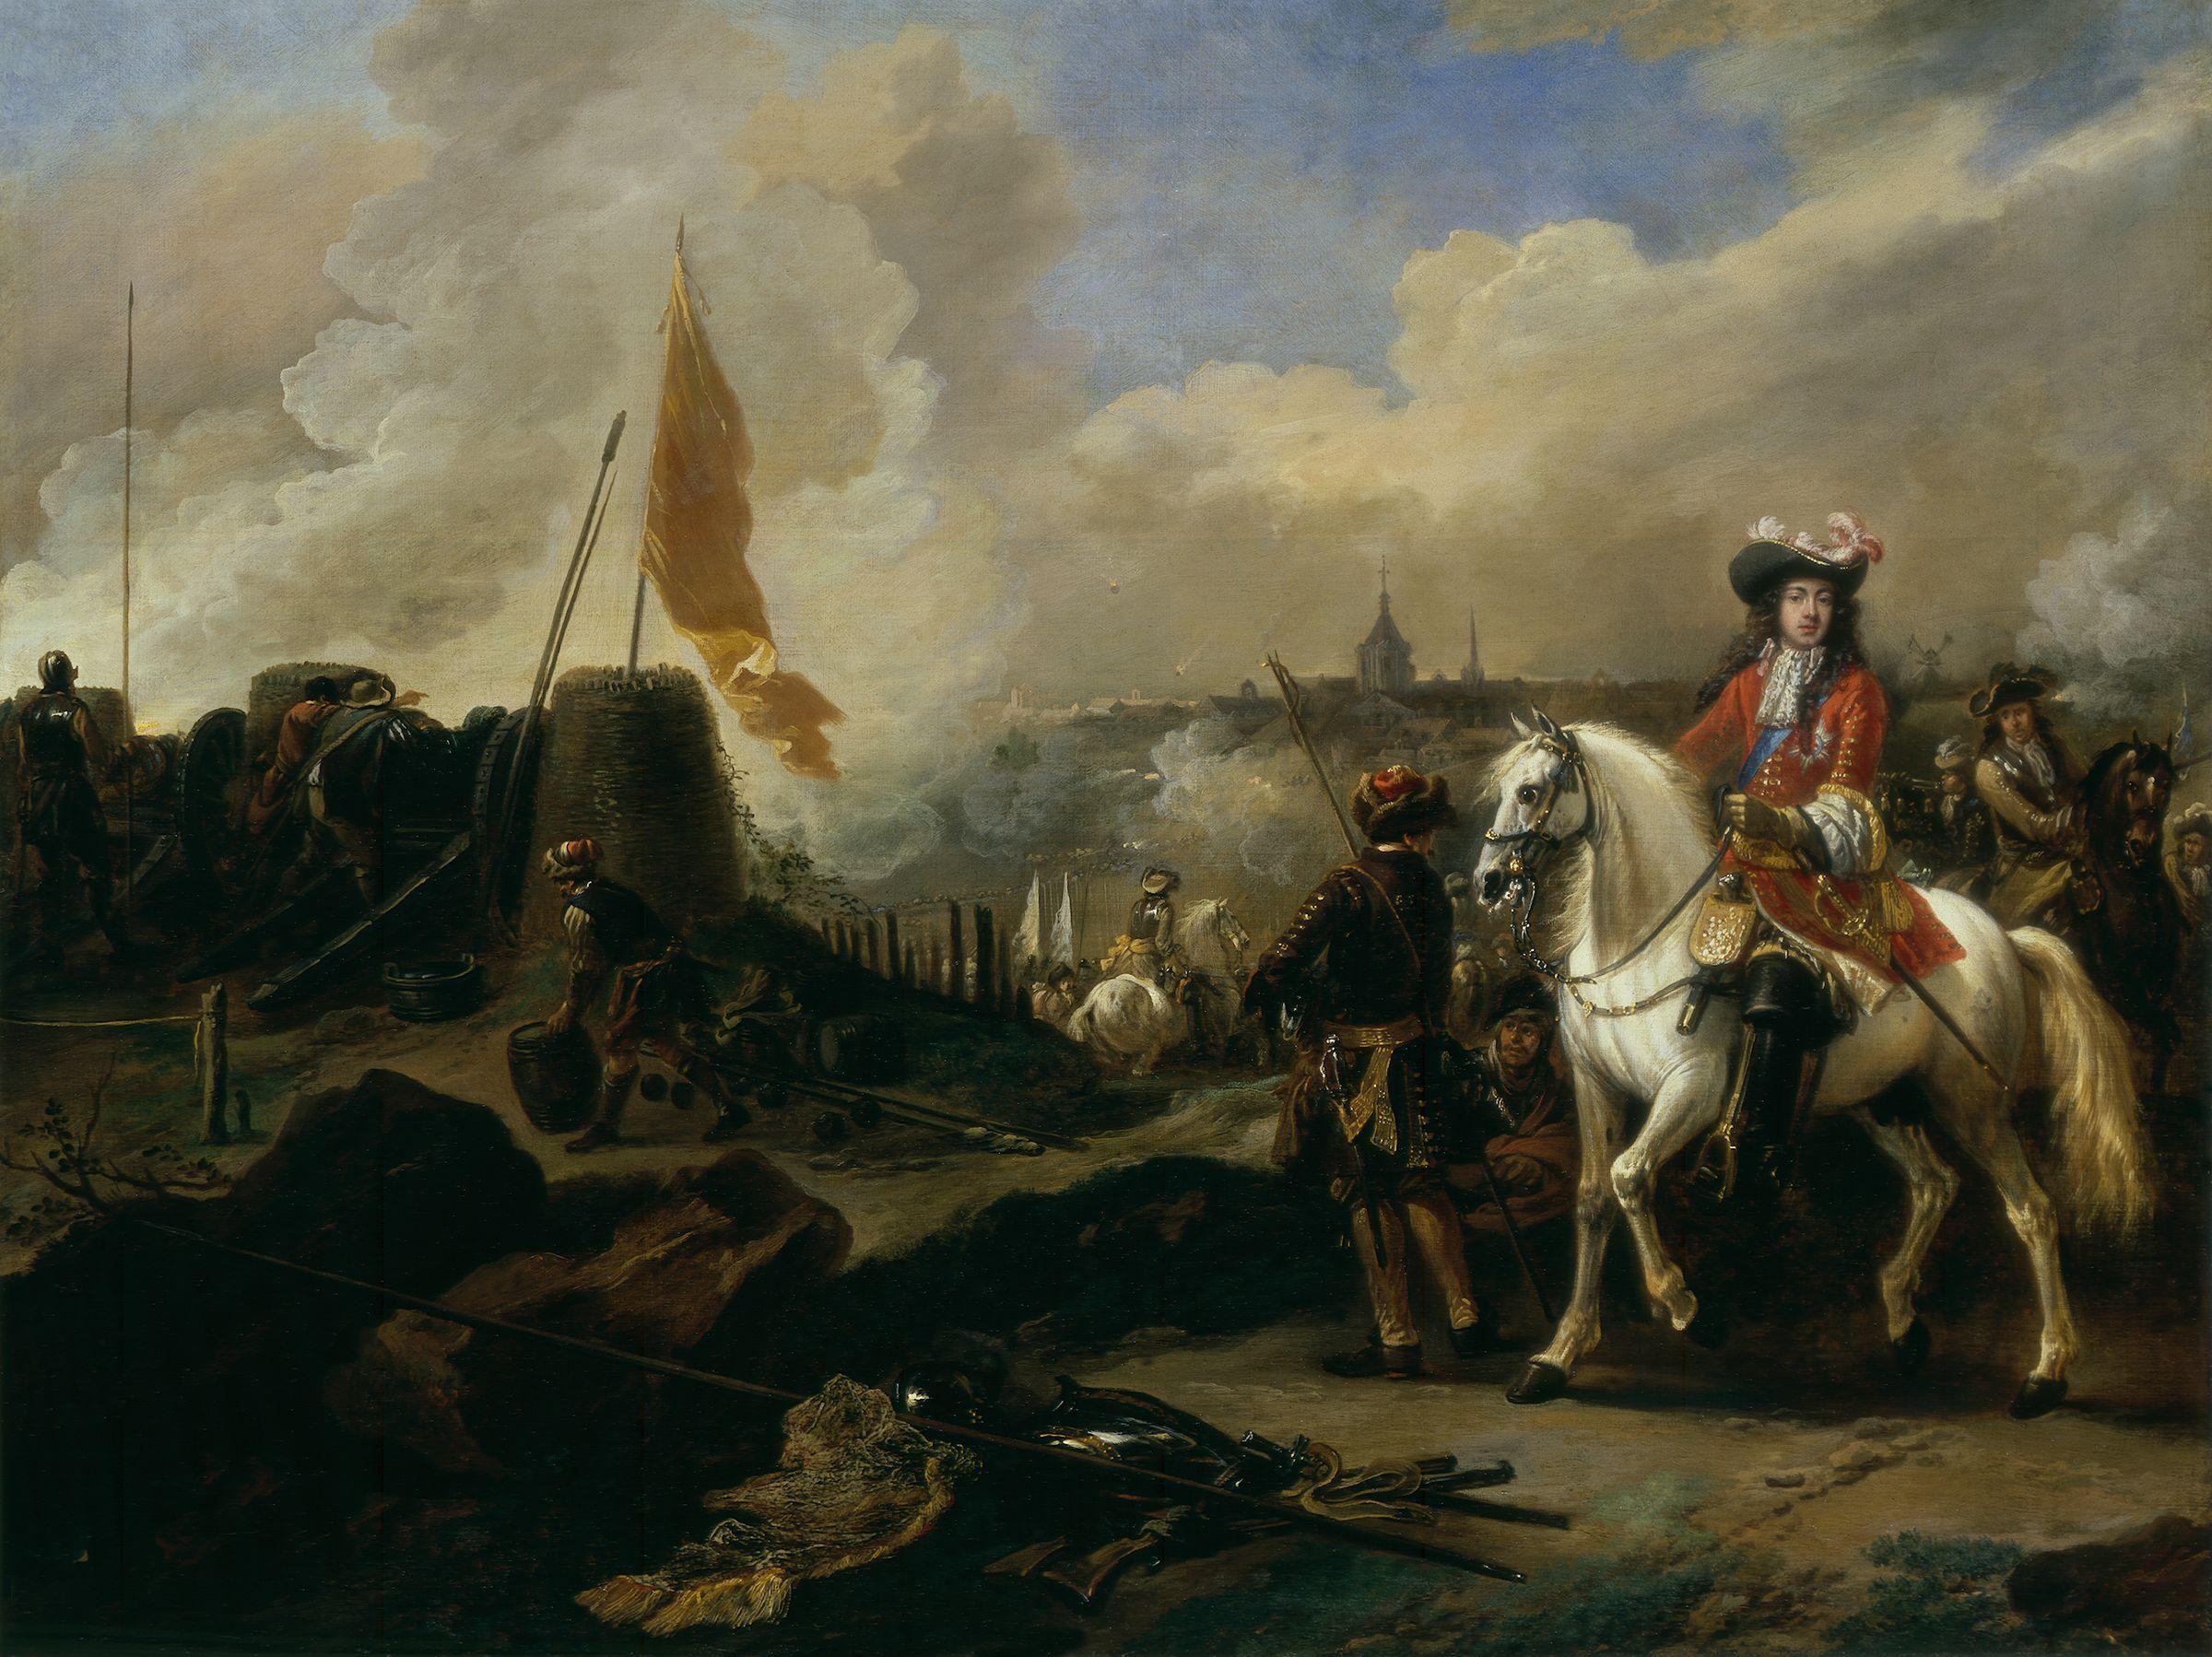 James Scott, Duke of Monmouth and Buccleuch by Jan van Wyck.jpg